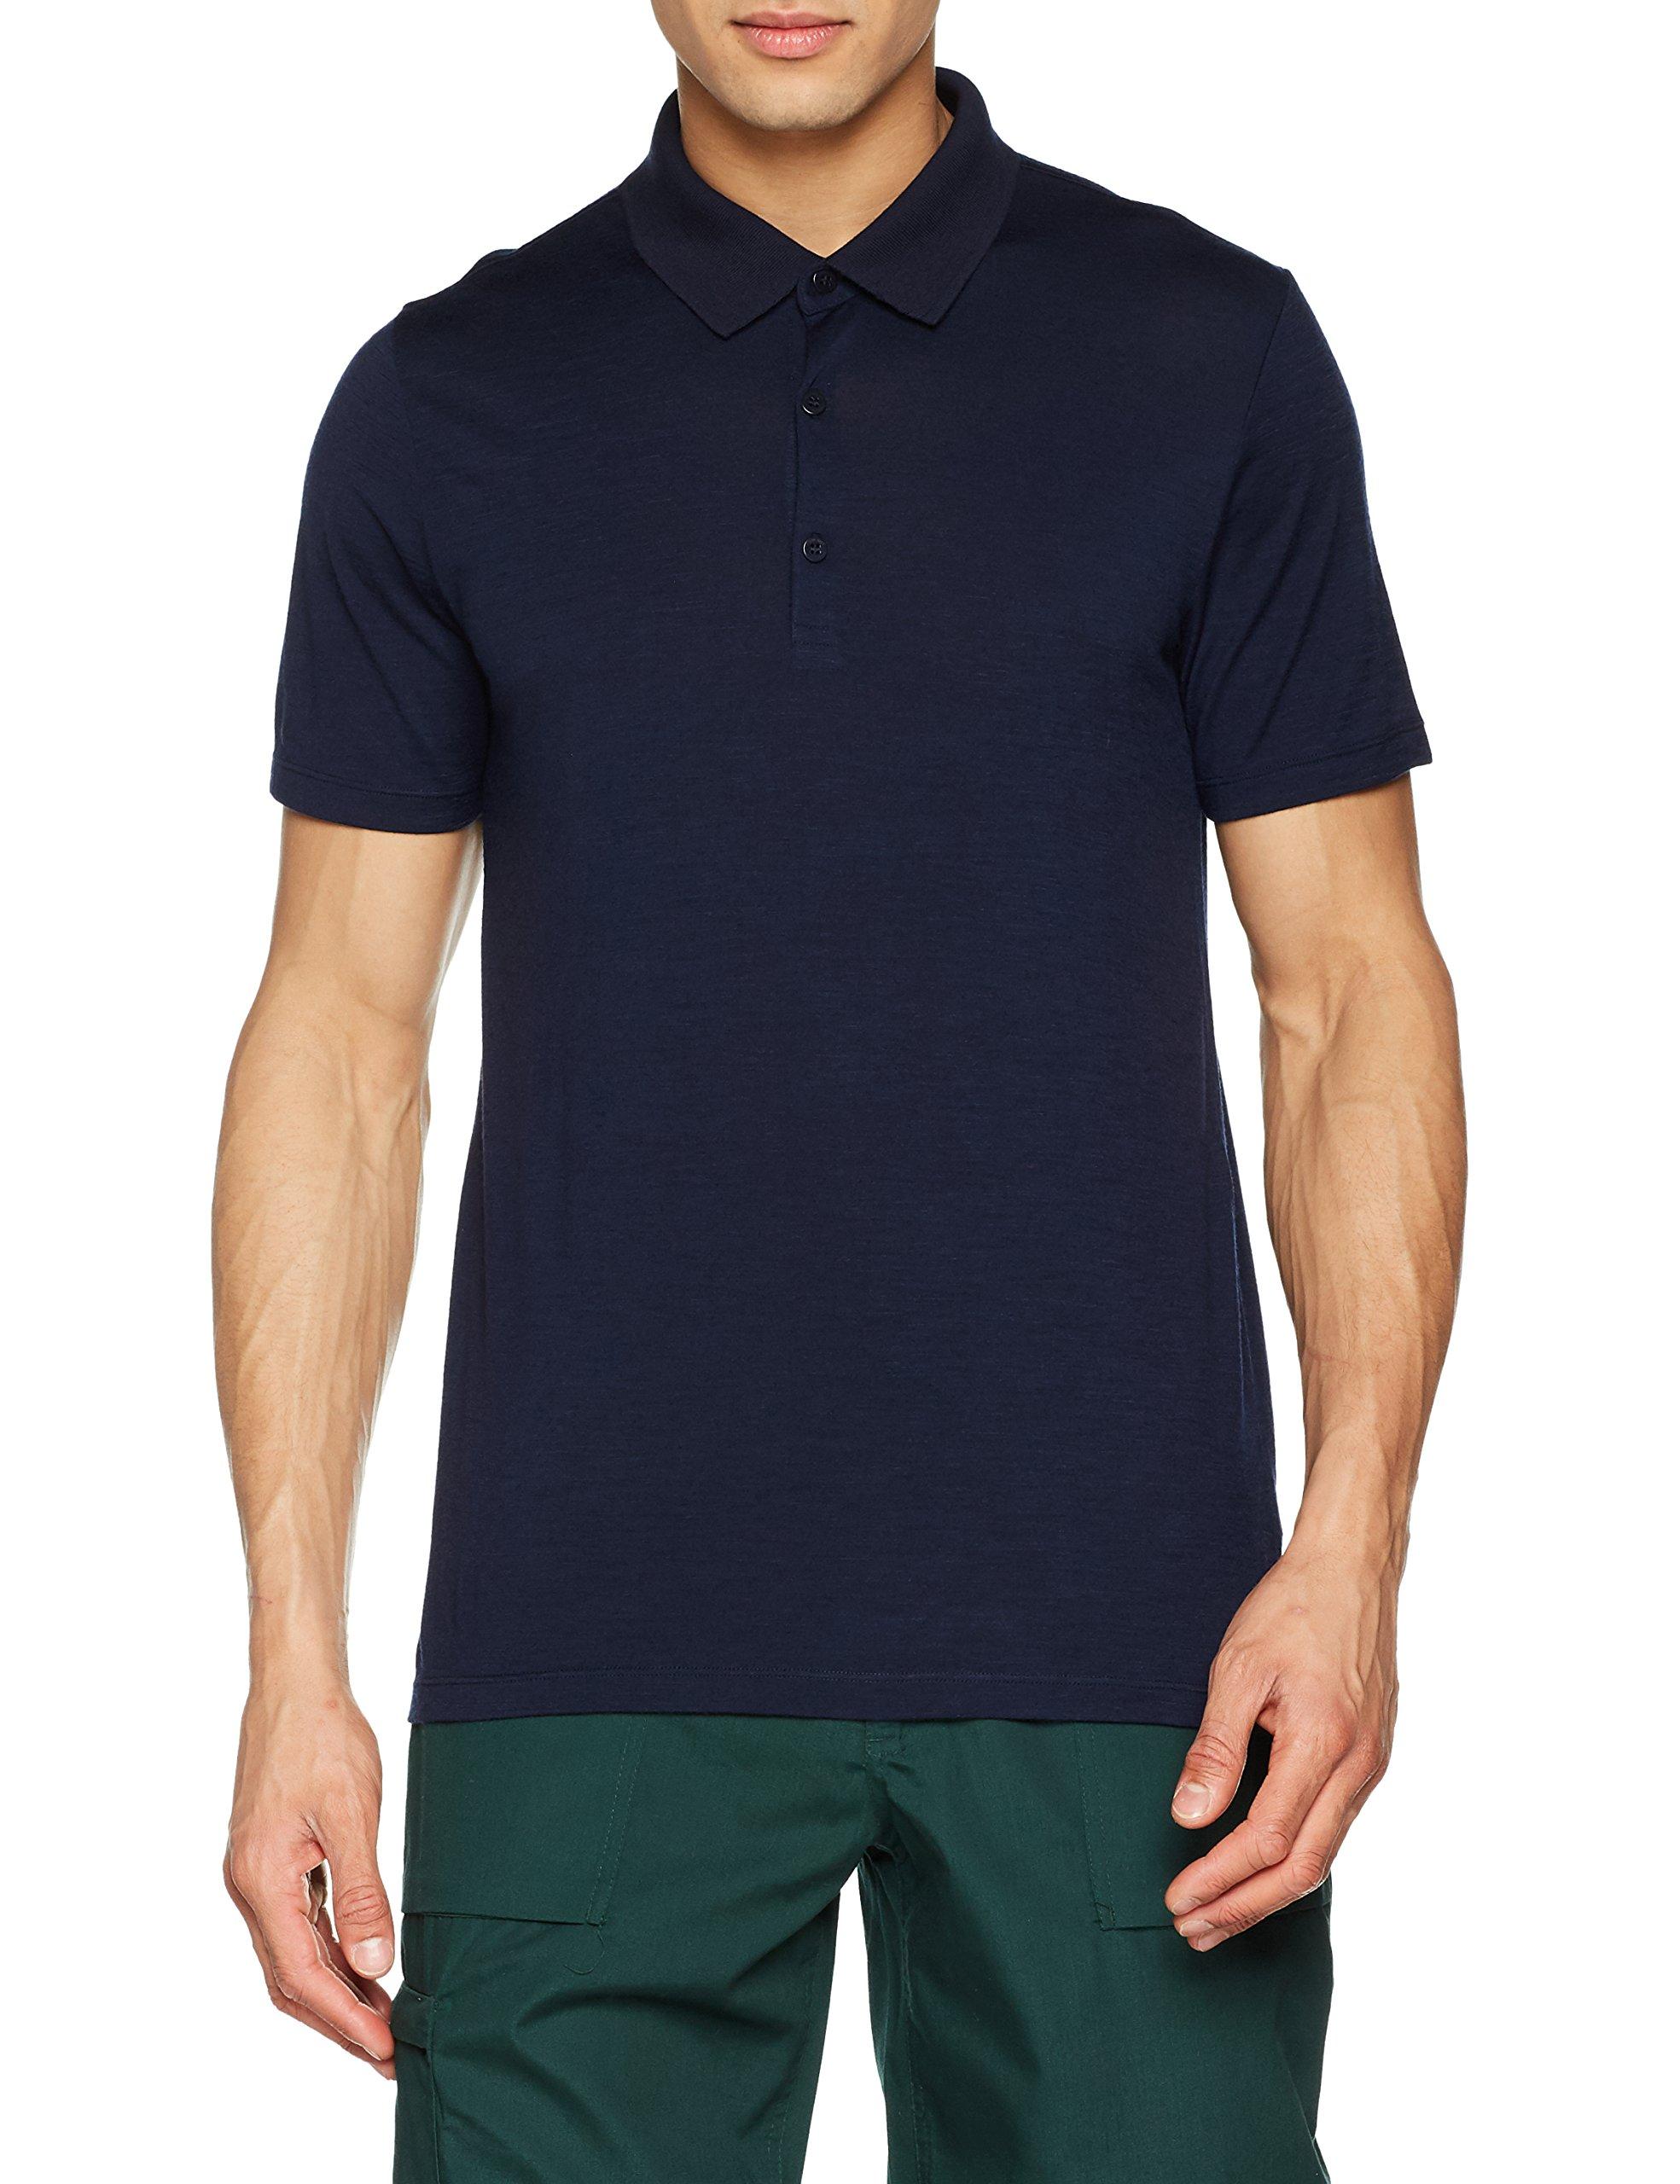 Icebreaker Merino Men's Tech Lite Short Sleeve Polo, Midnight Navy, XX-Large